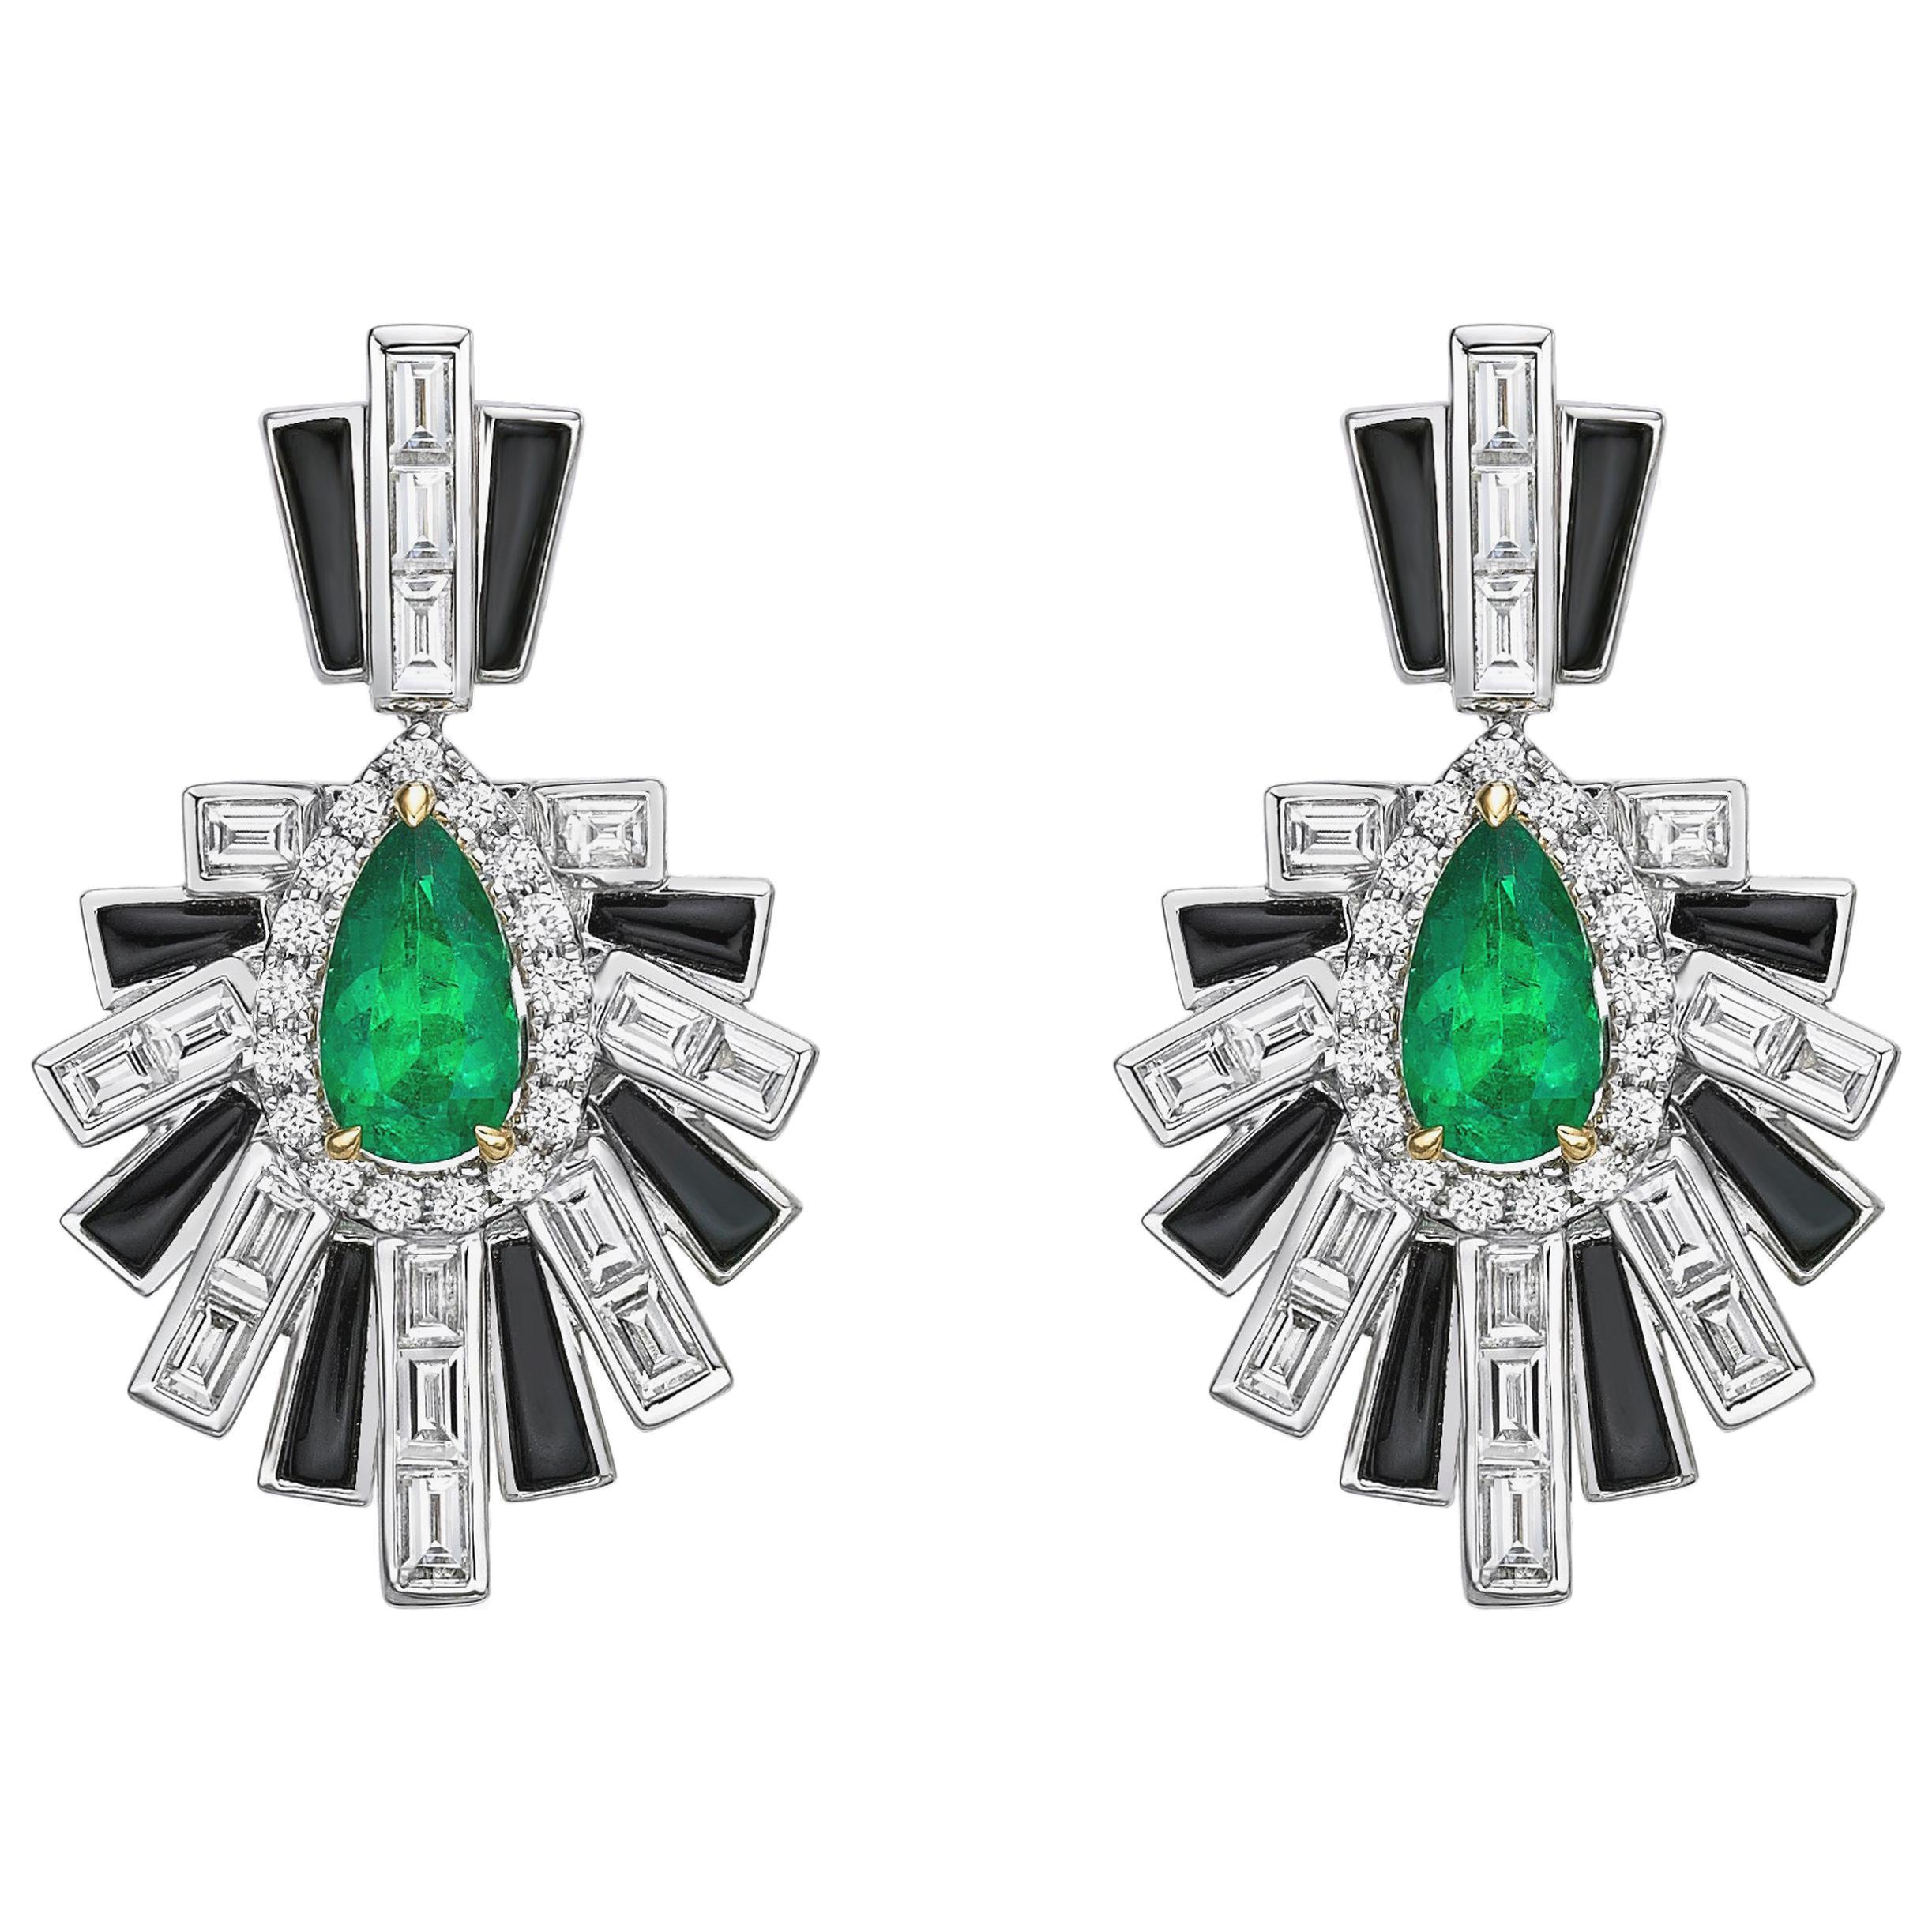 Art Deco Style Emerald, Black Onyx and Diamond Earrings in 18 Karat White Gold